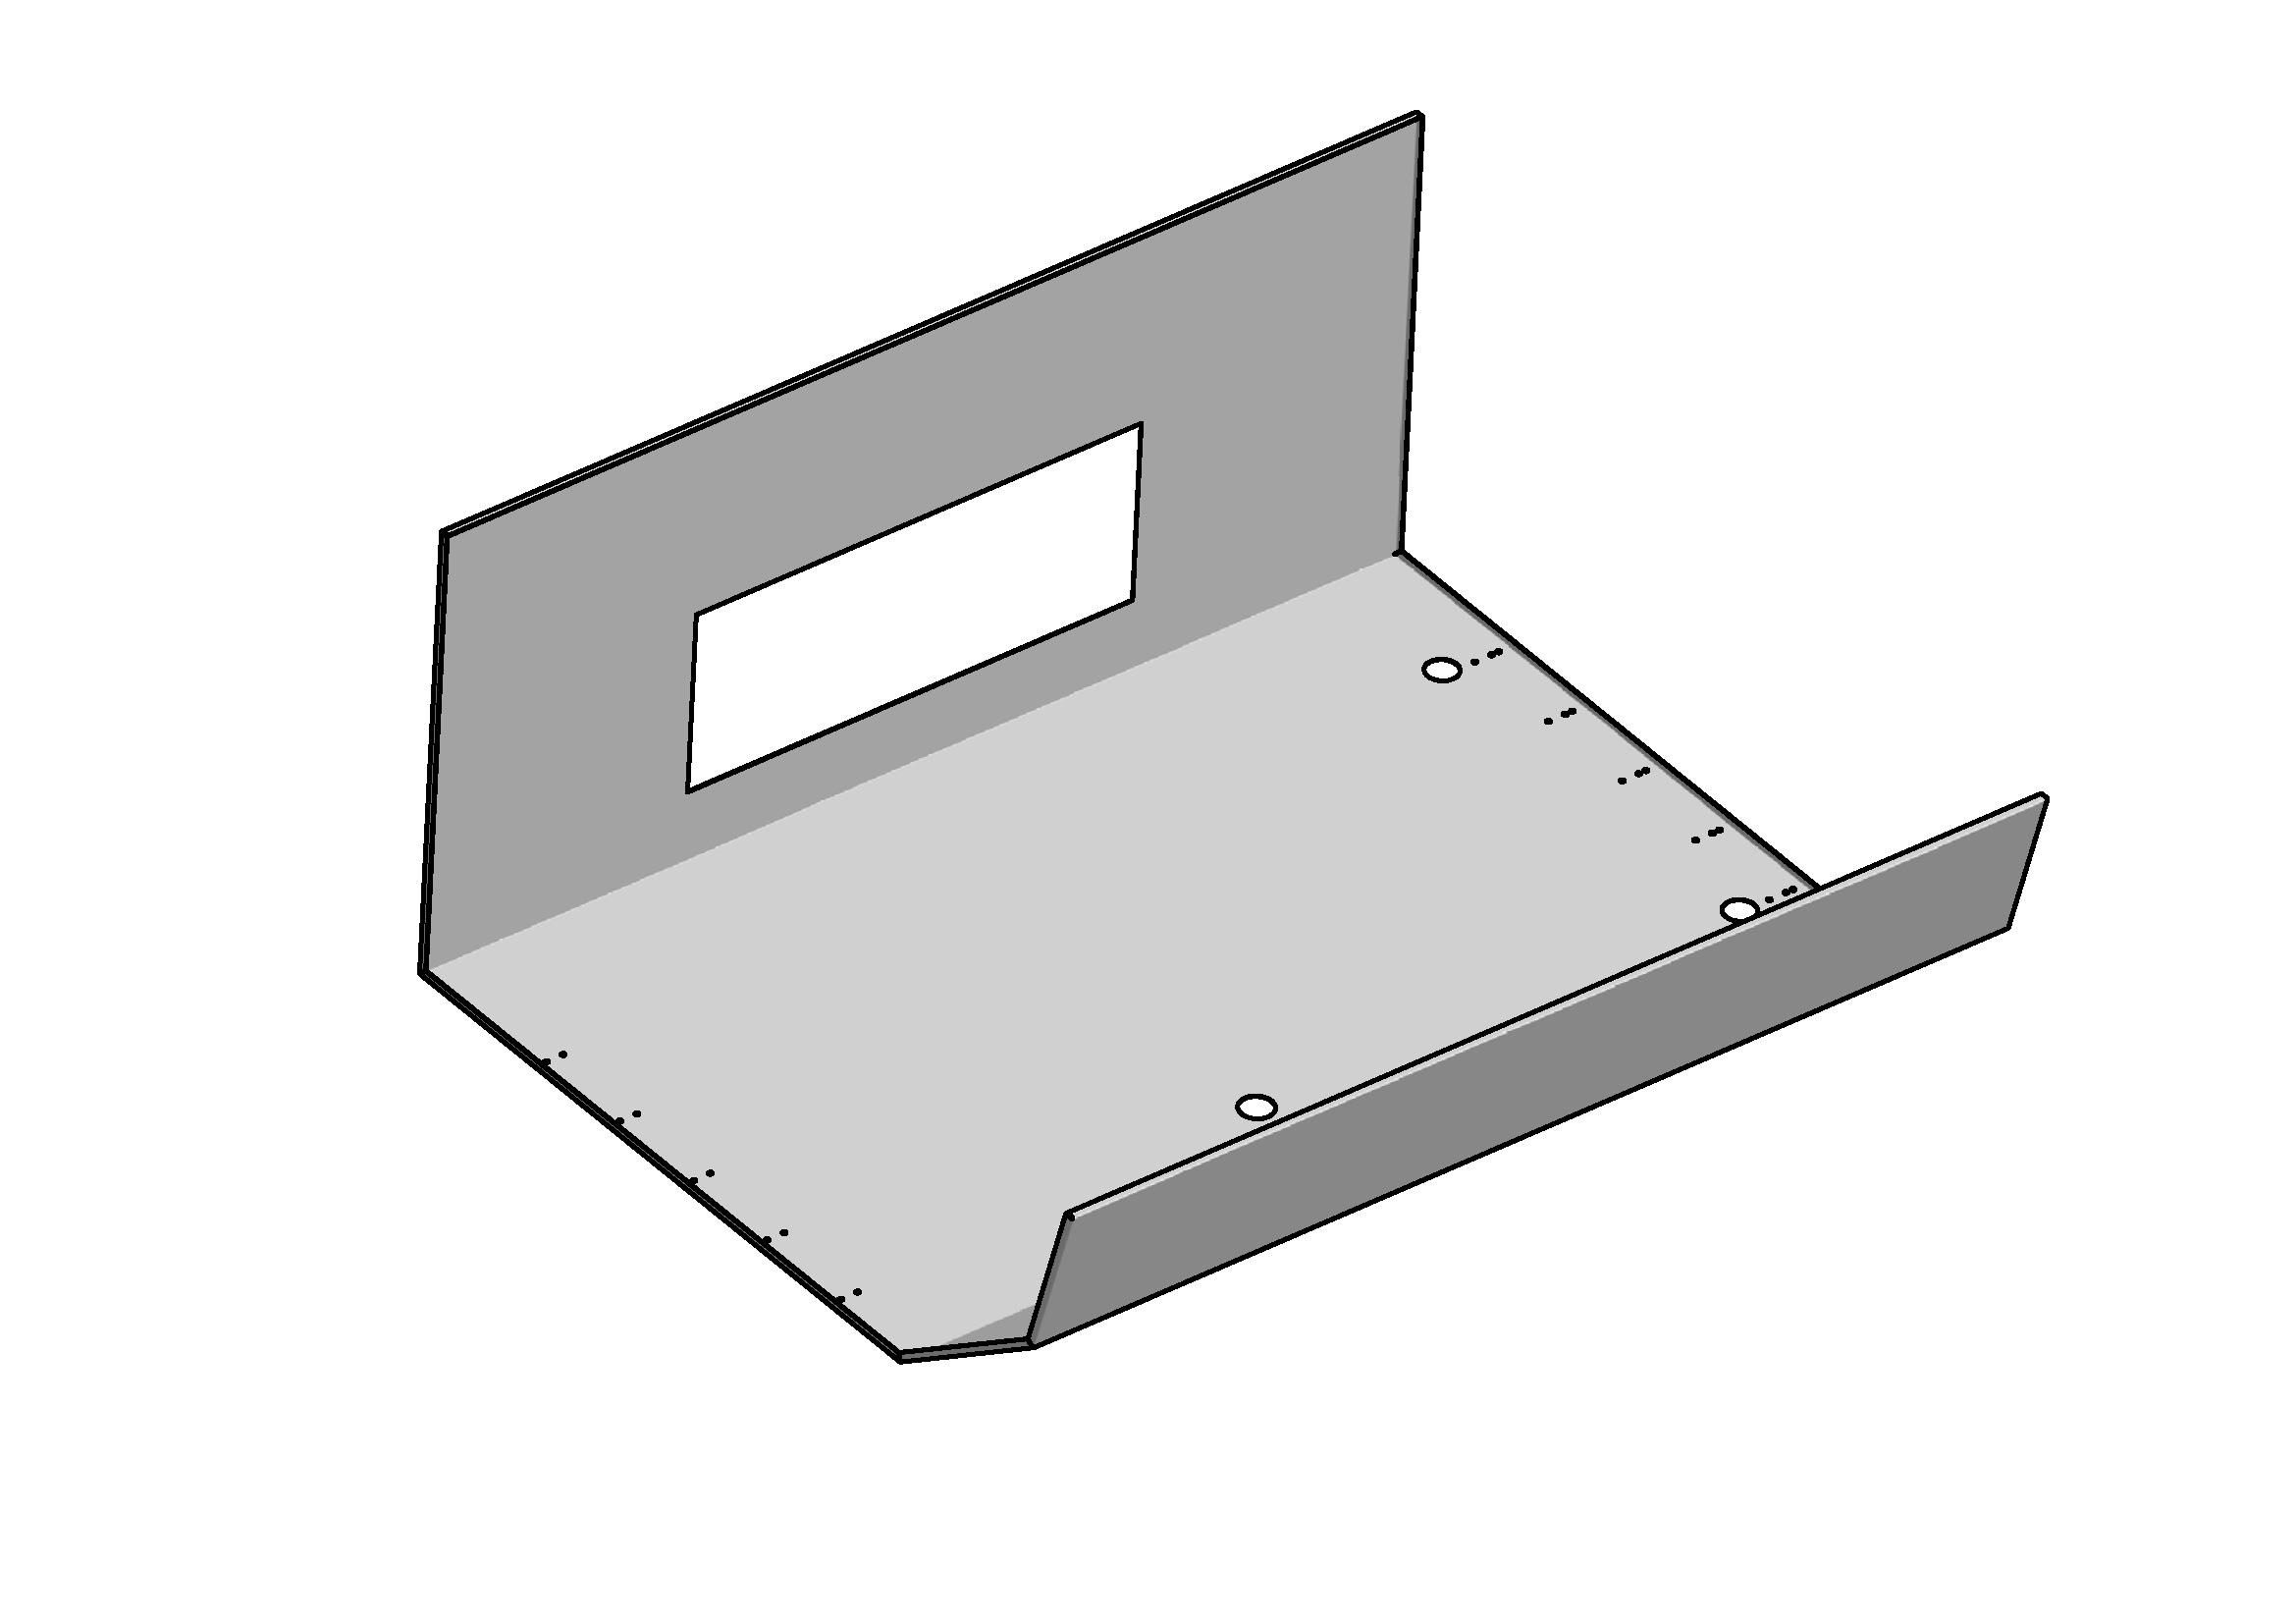 Integral Engineering Sheet Metal Design Services